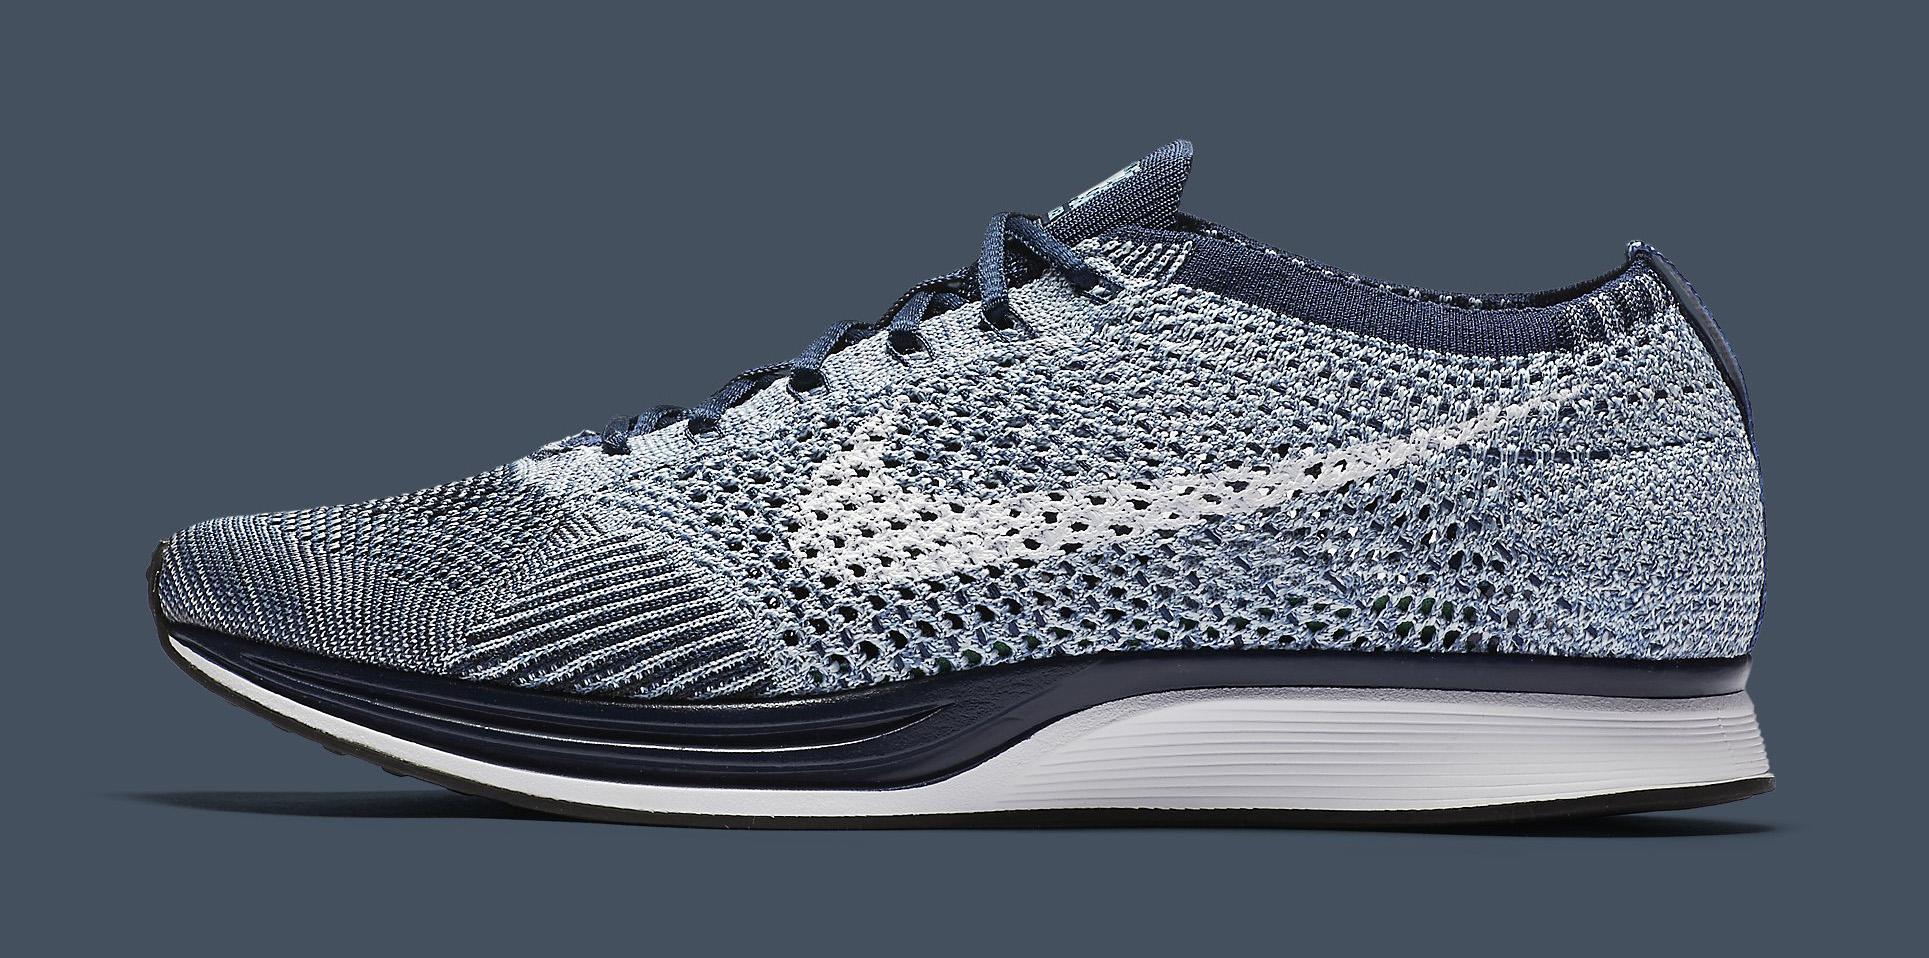 Nike Flyknit Racer Blue Tint White 862713-401 Profile